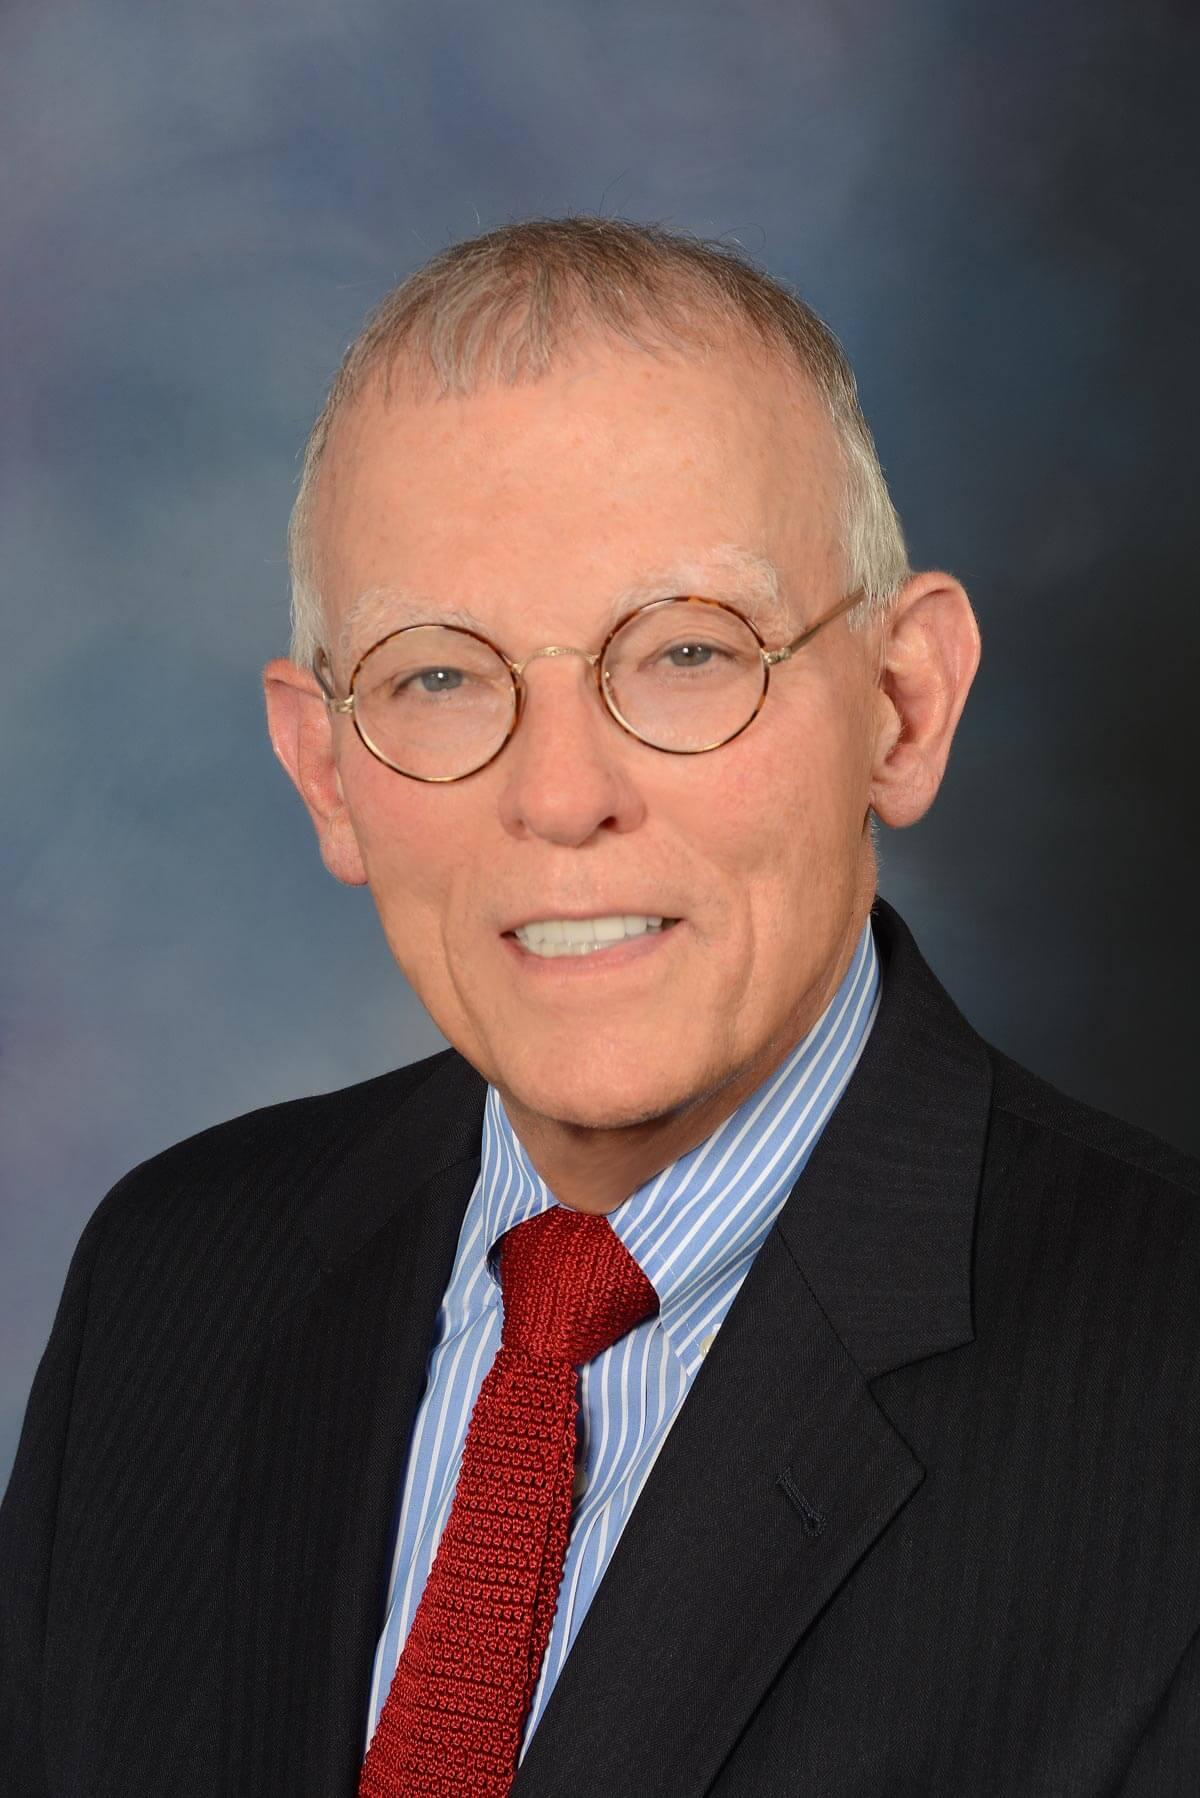 Author Nelson Johnson